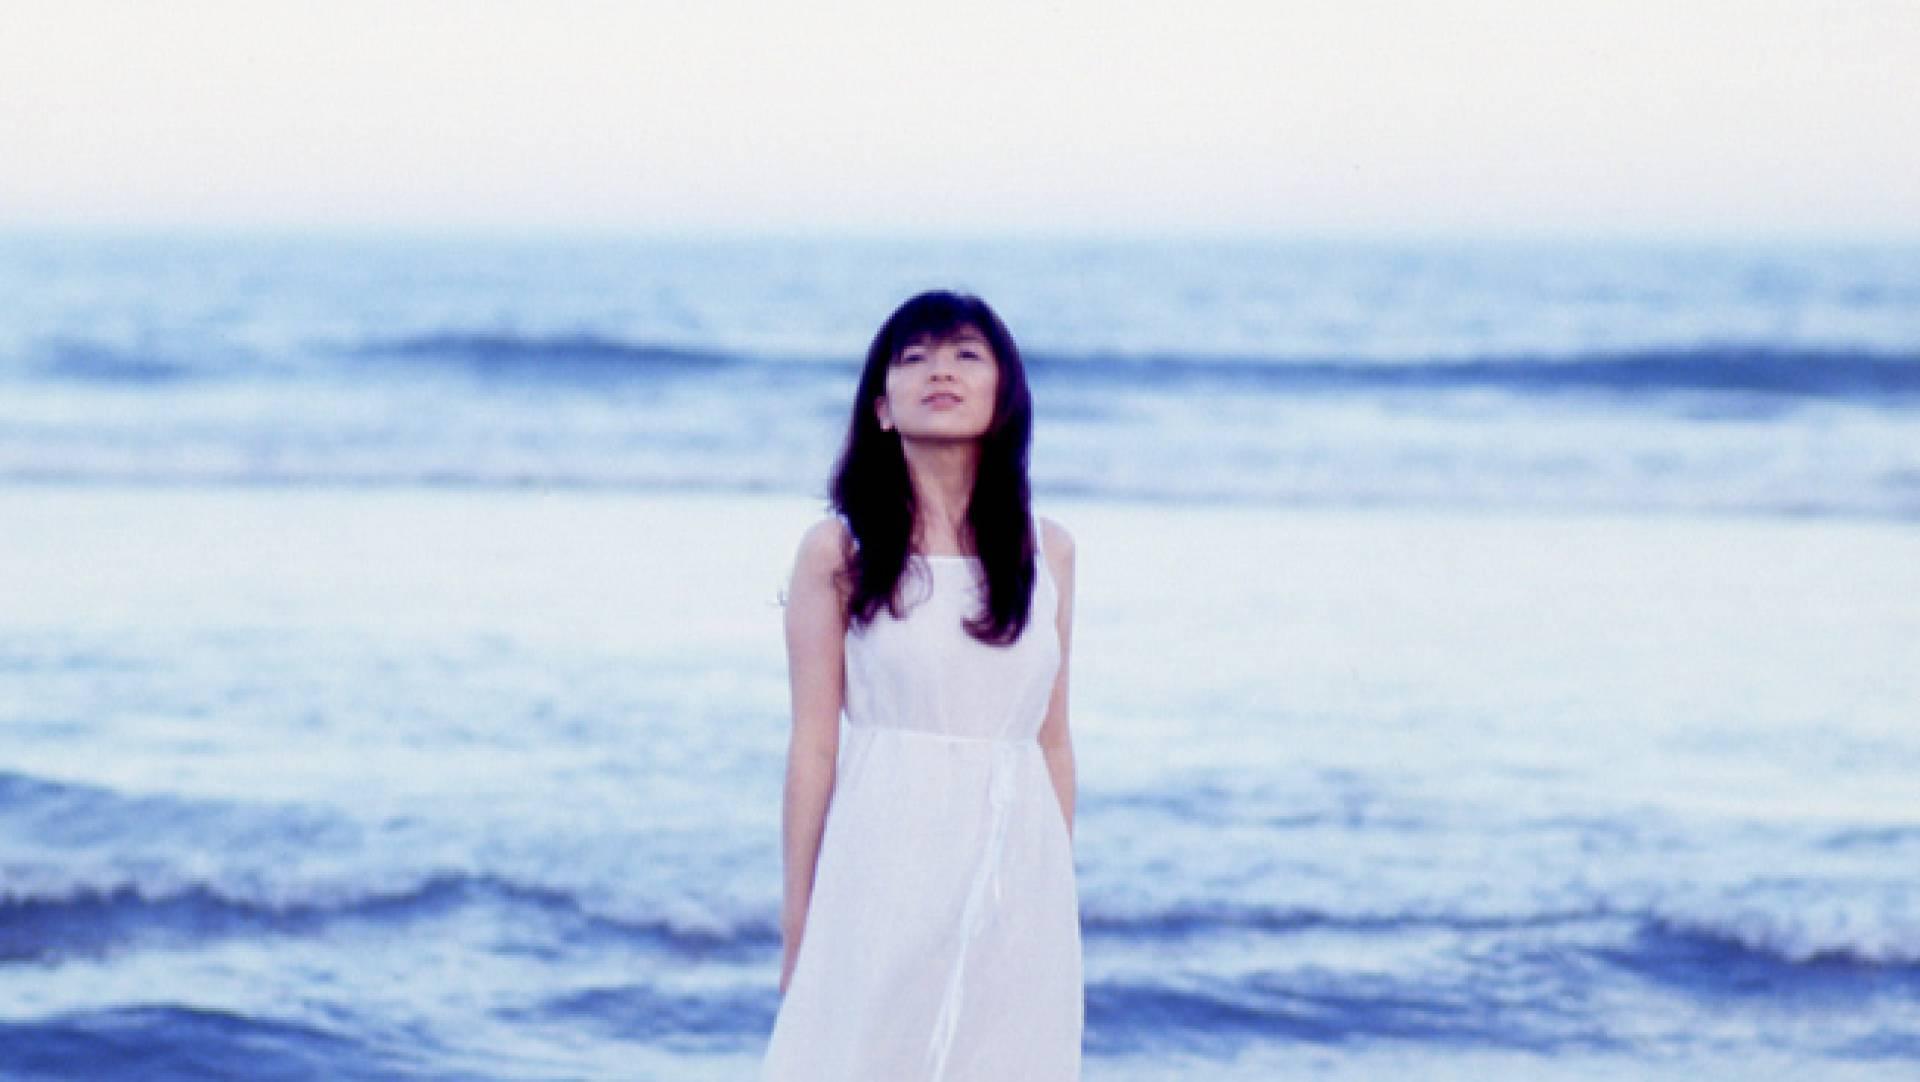 Onodera Ayano